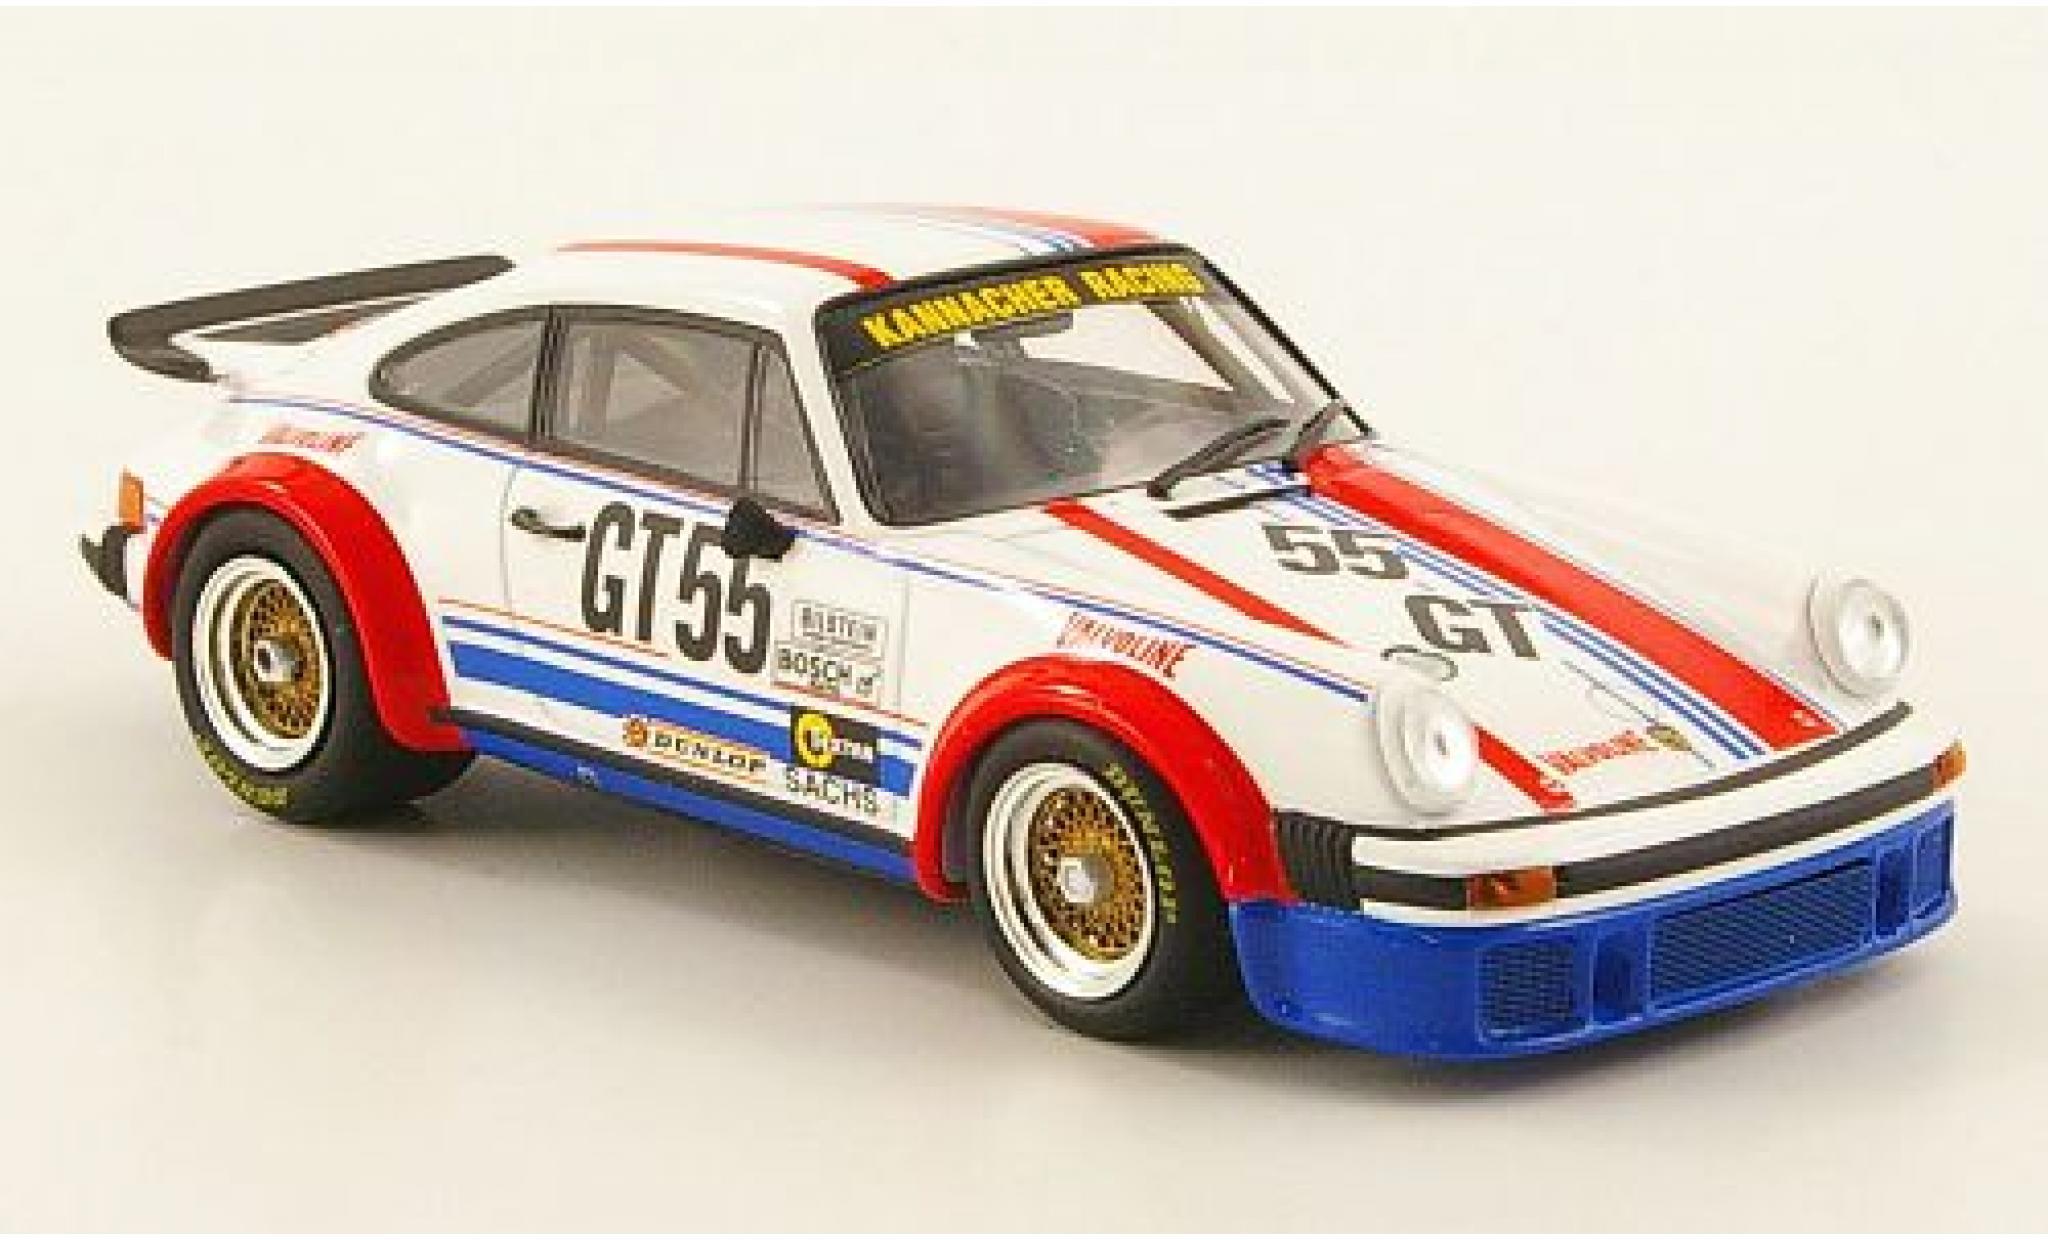 Porsche 934 1976 1/43 Minichamps No.55 Valvoline ADAC 300 Km EGT E.Sindel